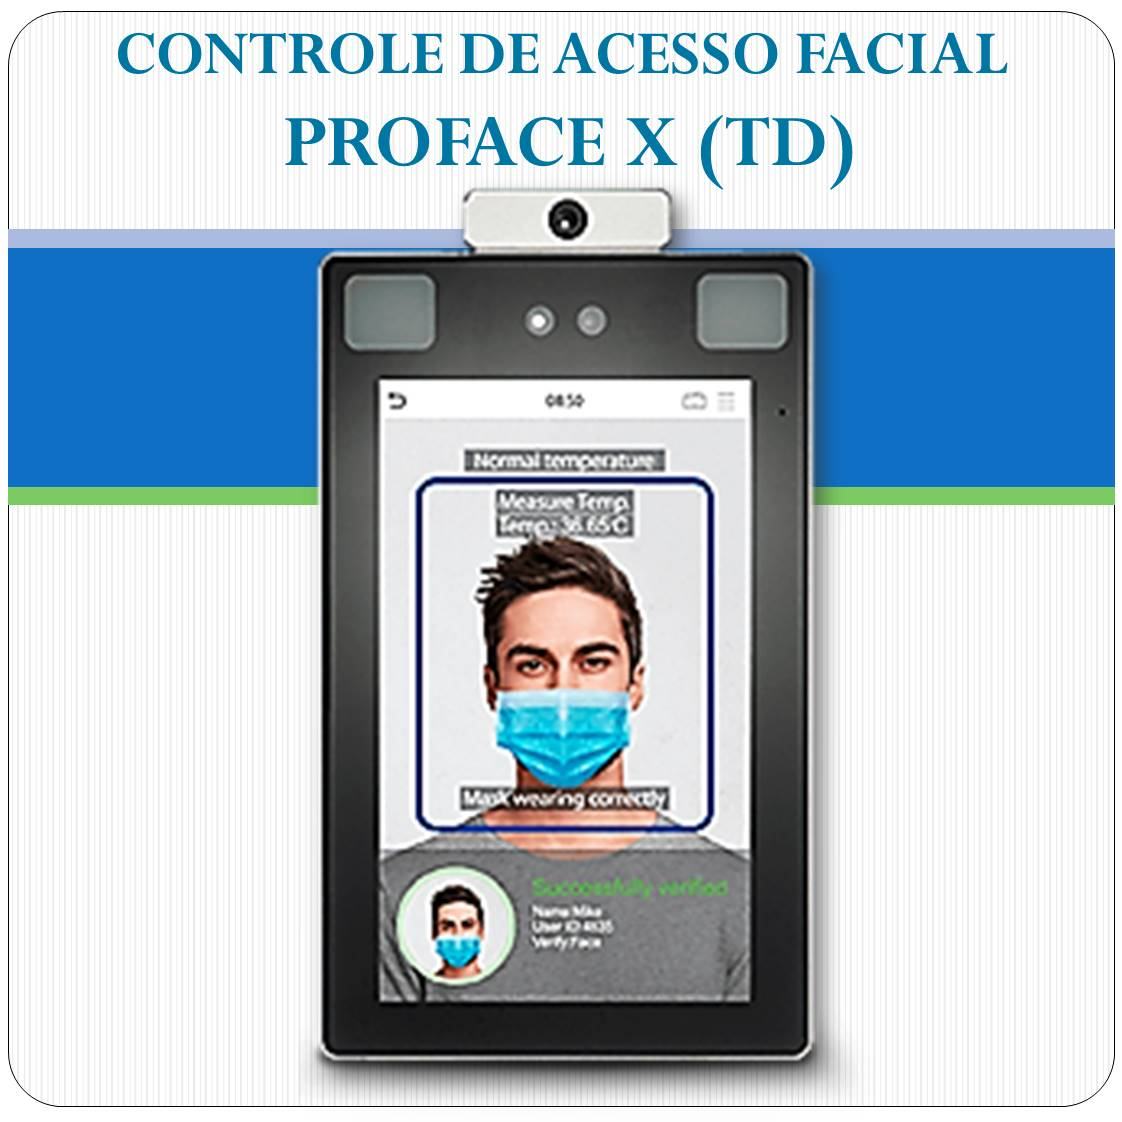 Controle de Acesso Facial - PROFace X